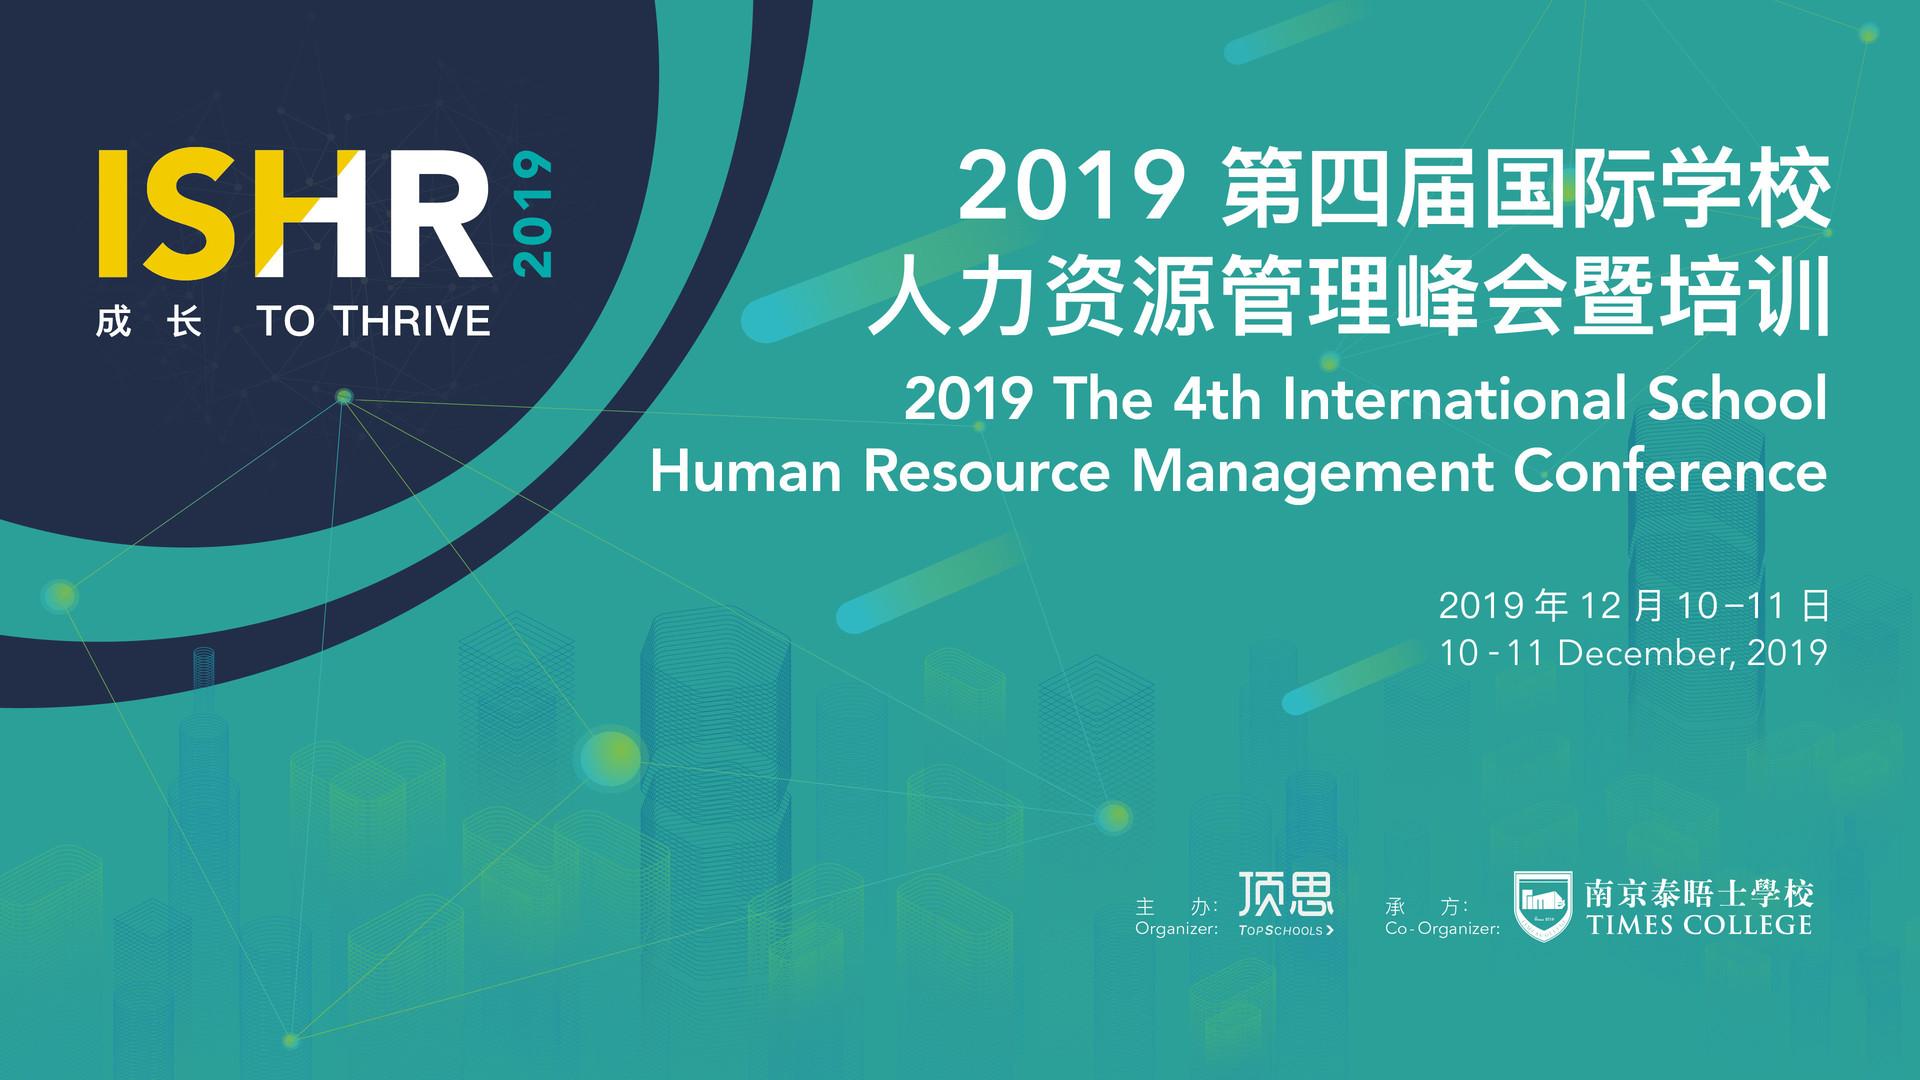 ISHR 2019 第四届国际学校人力资源管理峰会暨培训